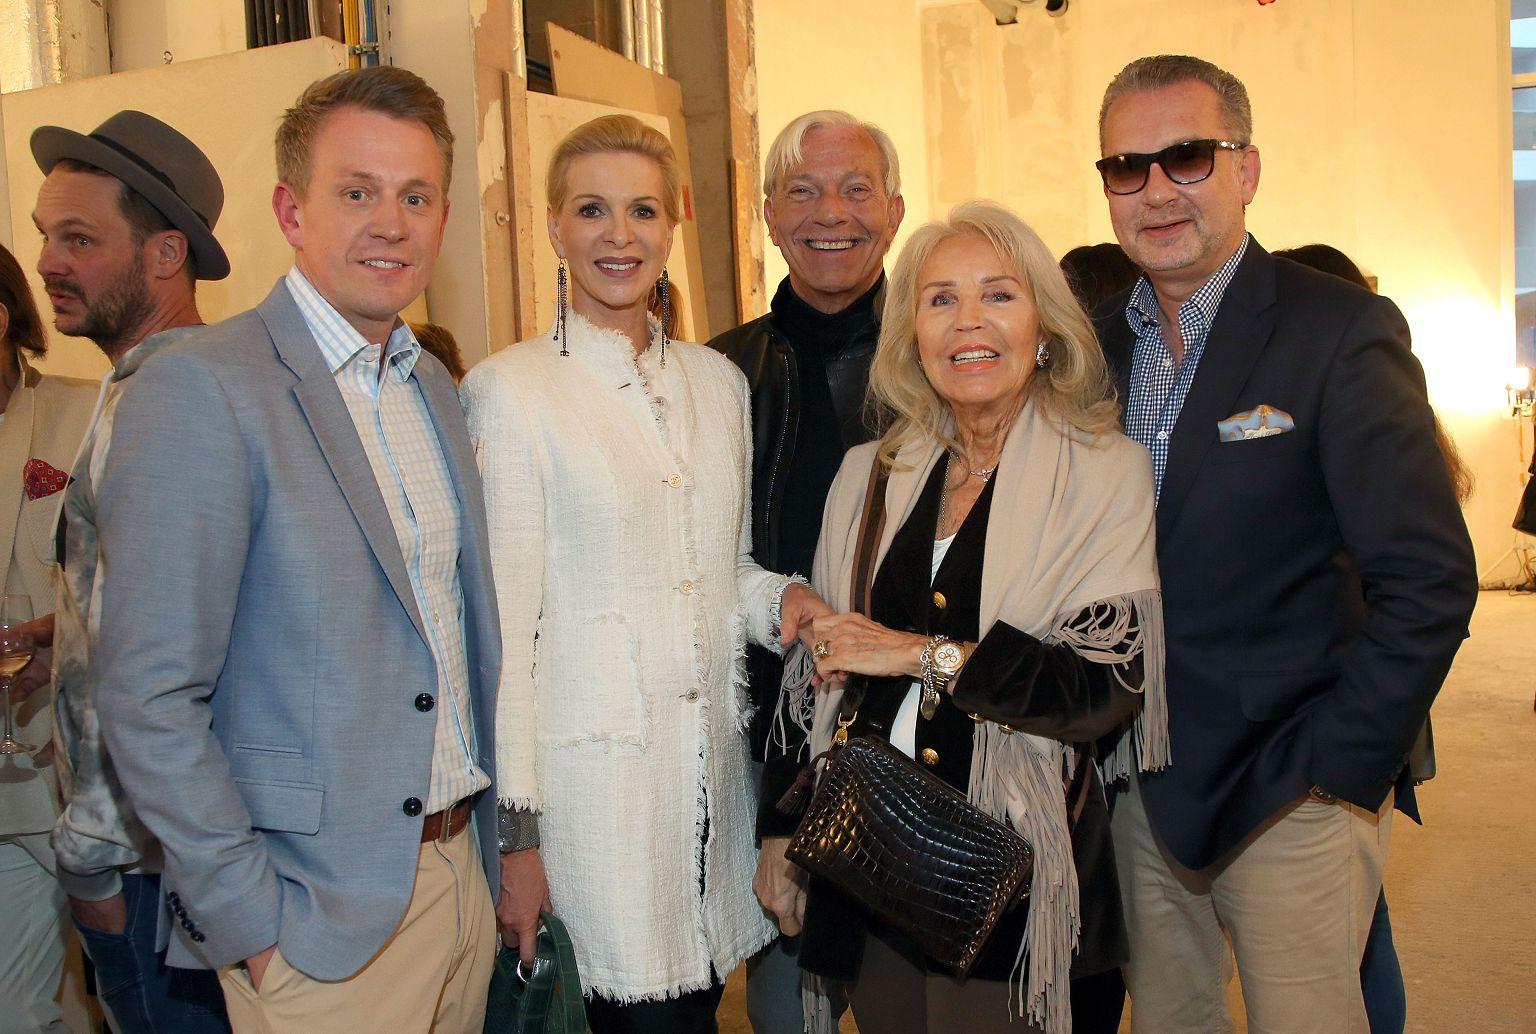 Gäste der Vernissage René Turrek 2018 Gruppenbild